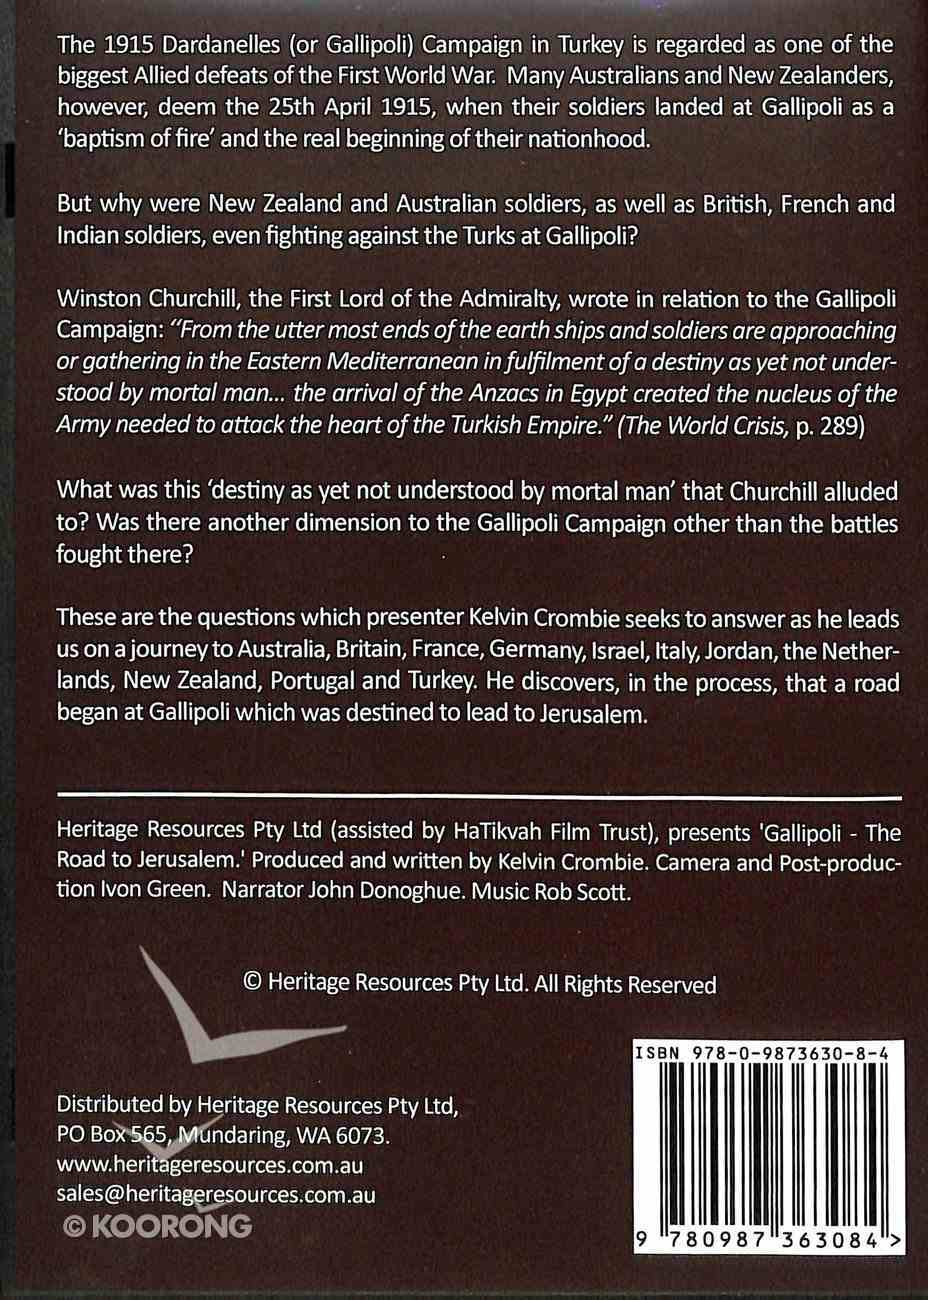 Gallipoli - the Road to Jerusalem DVD